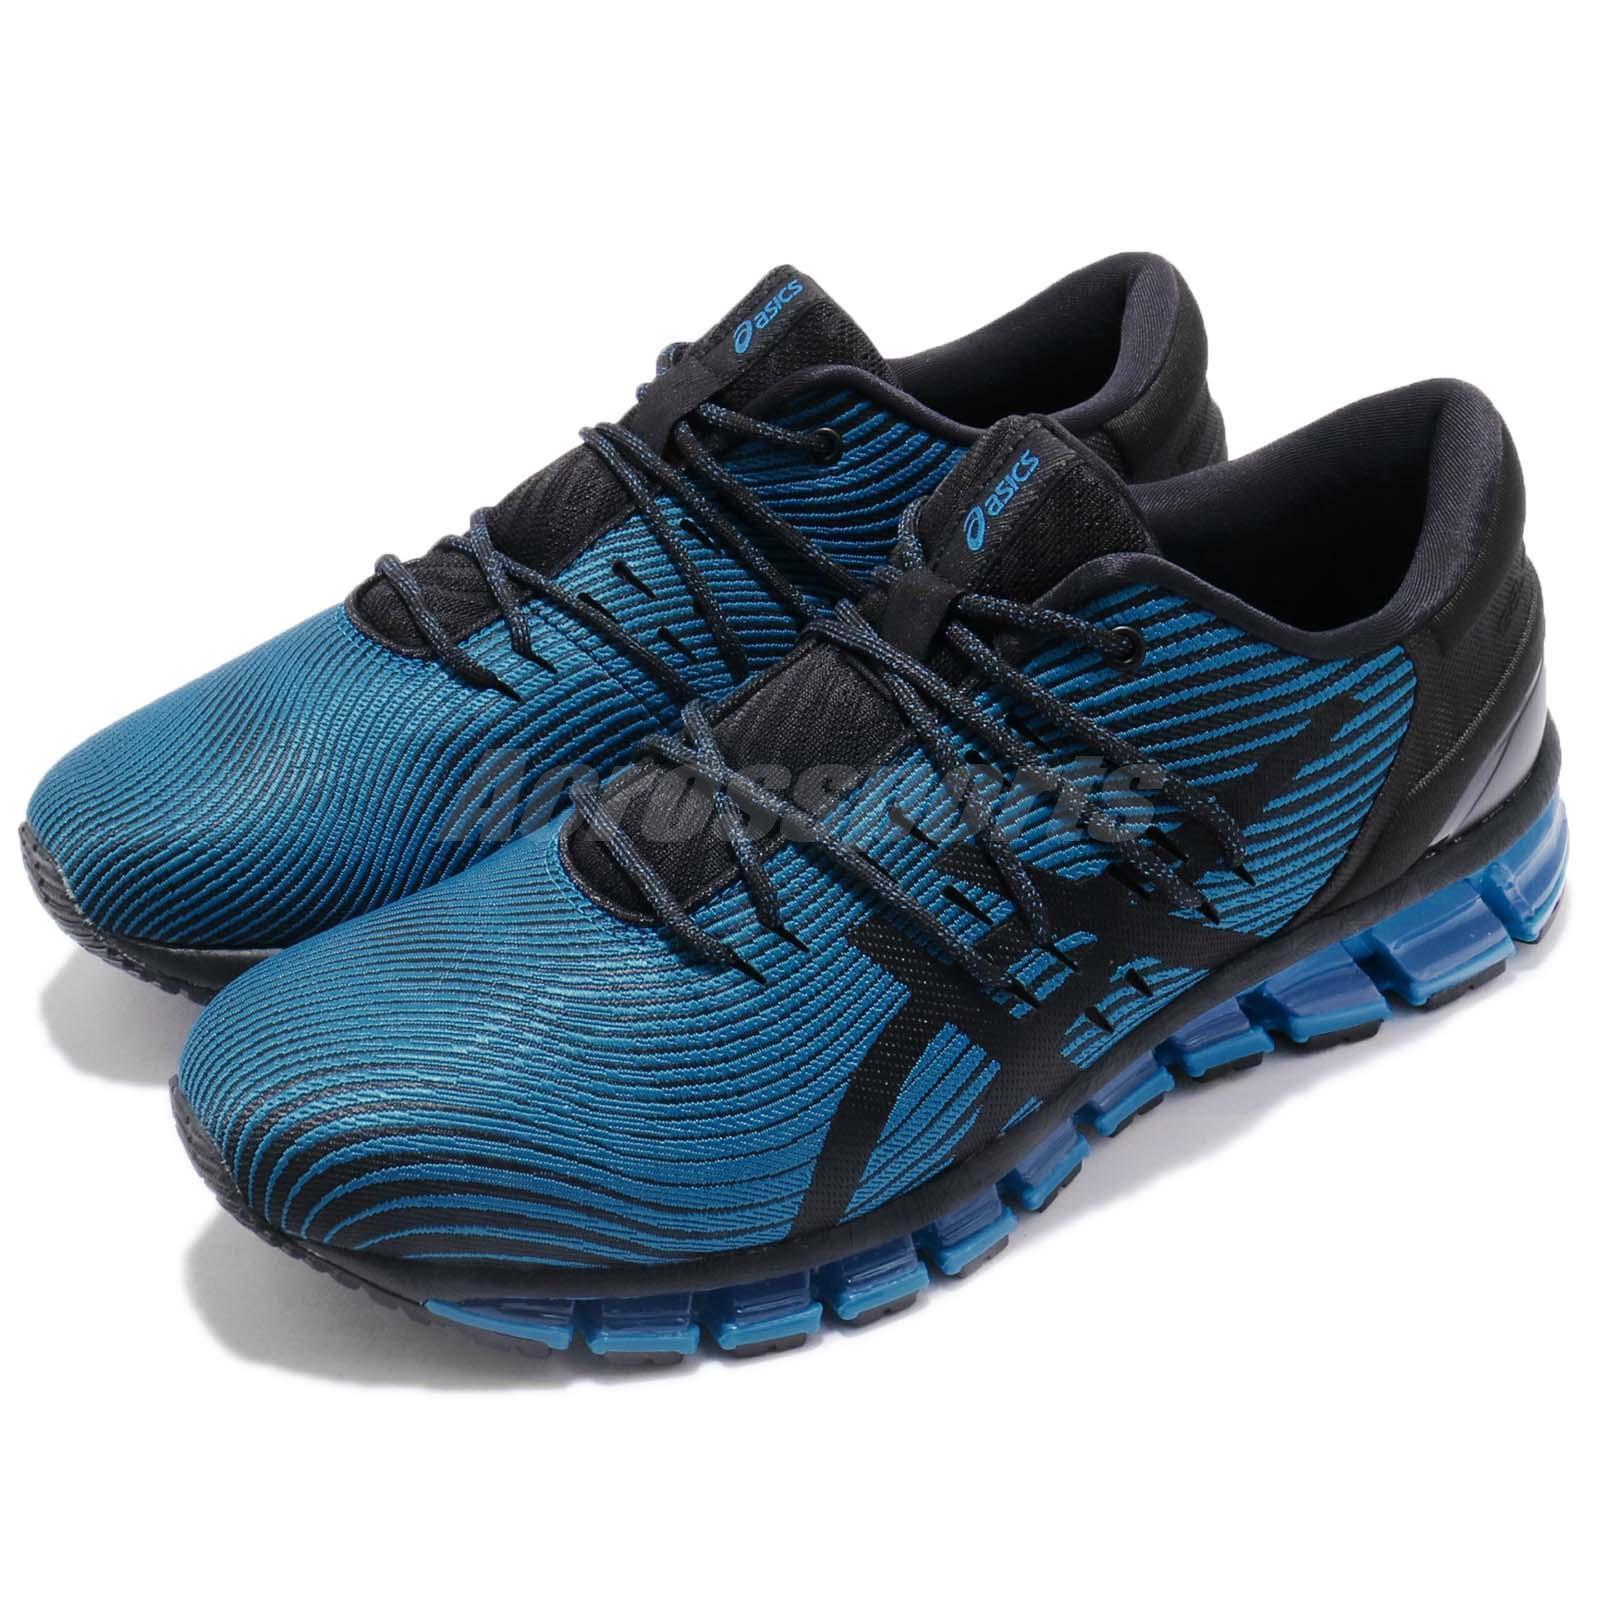 Asics Gel-Quantum 360 4 Race azul negro Men Running zapatos zapatillas 1021A028-400